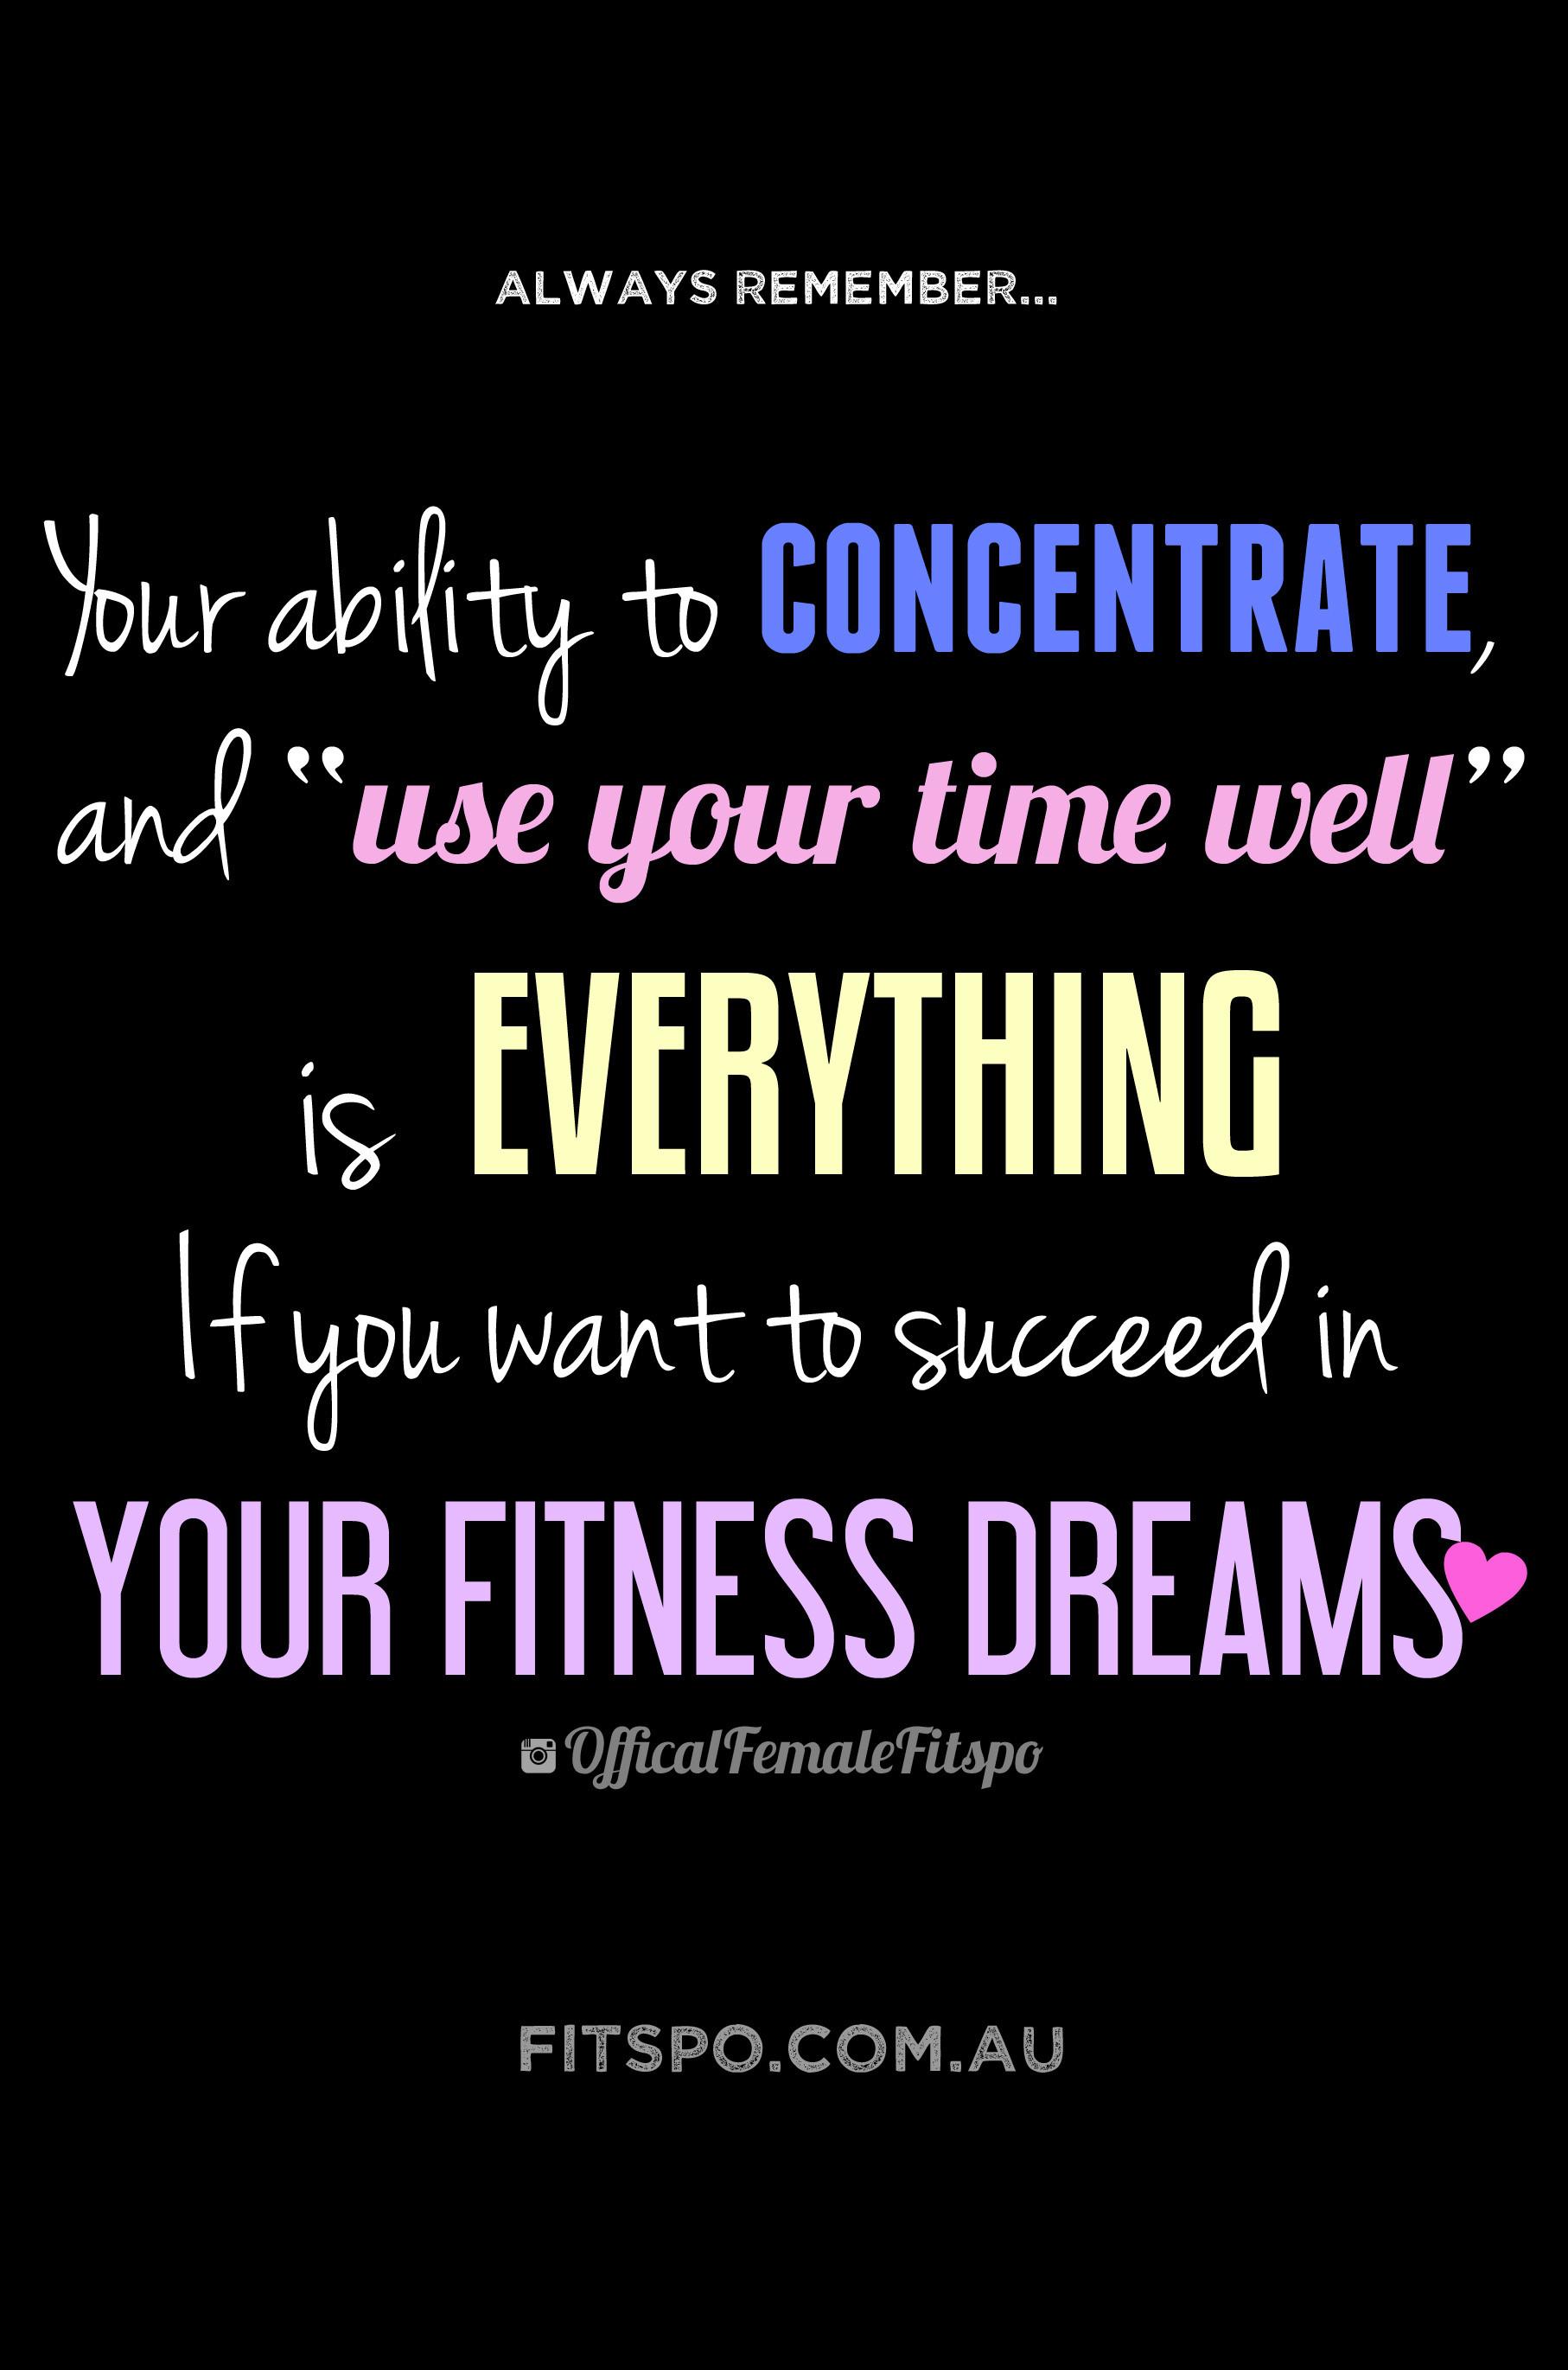 #iphone4 #wallpaper #fitness #fitspo #fitspiration #inspiration #motivation